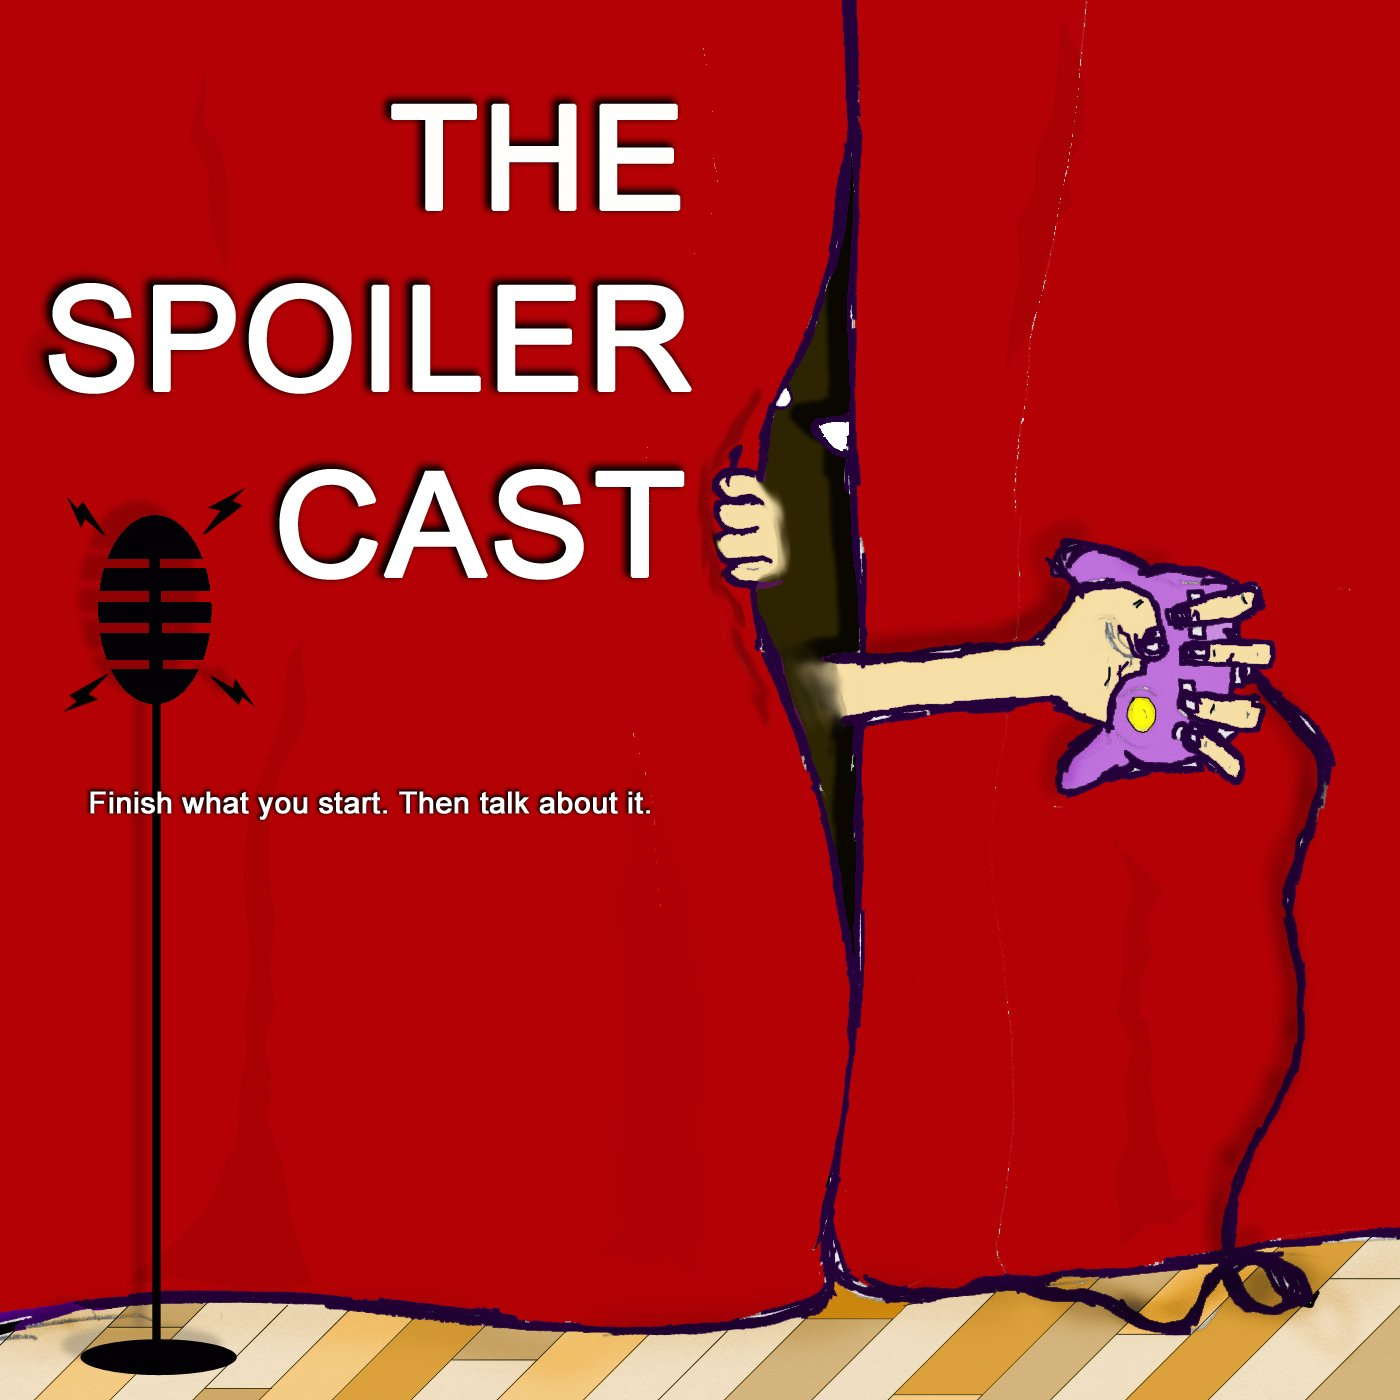 The Spoiler Cast spoilercast